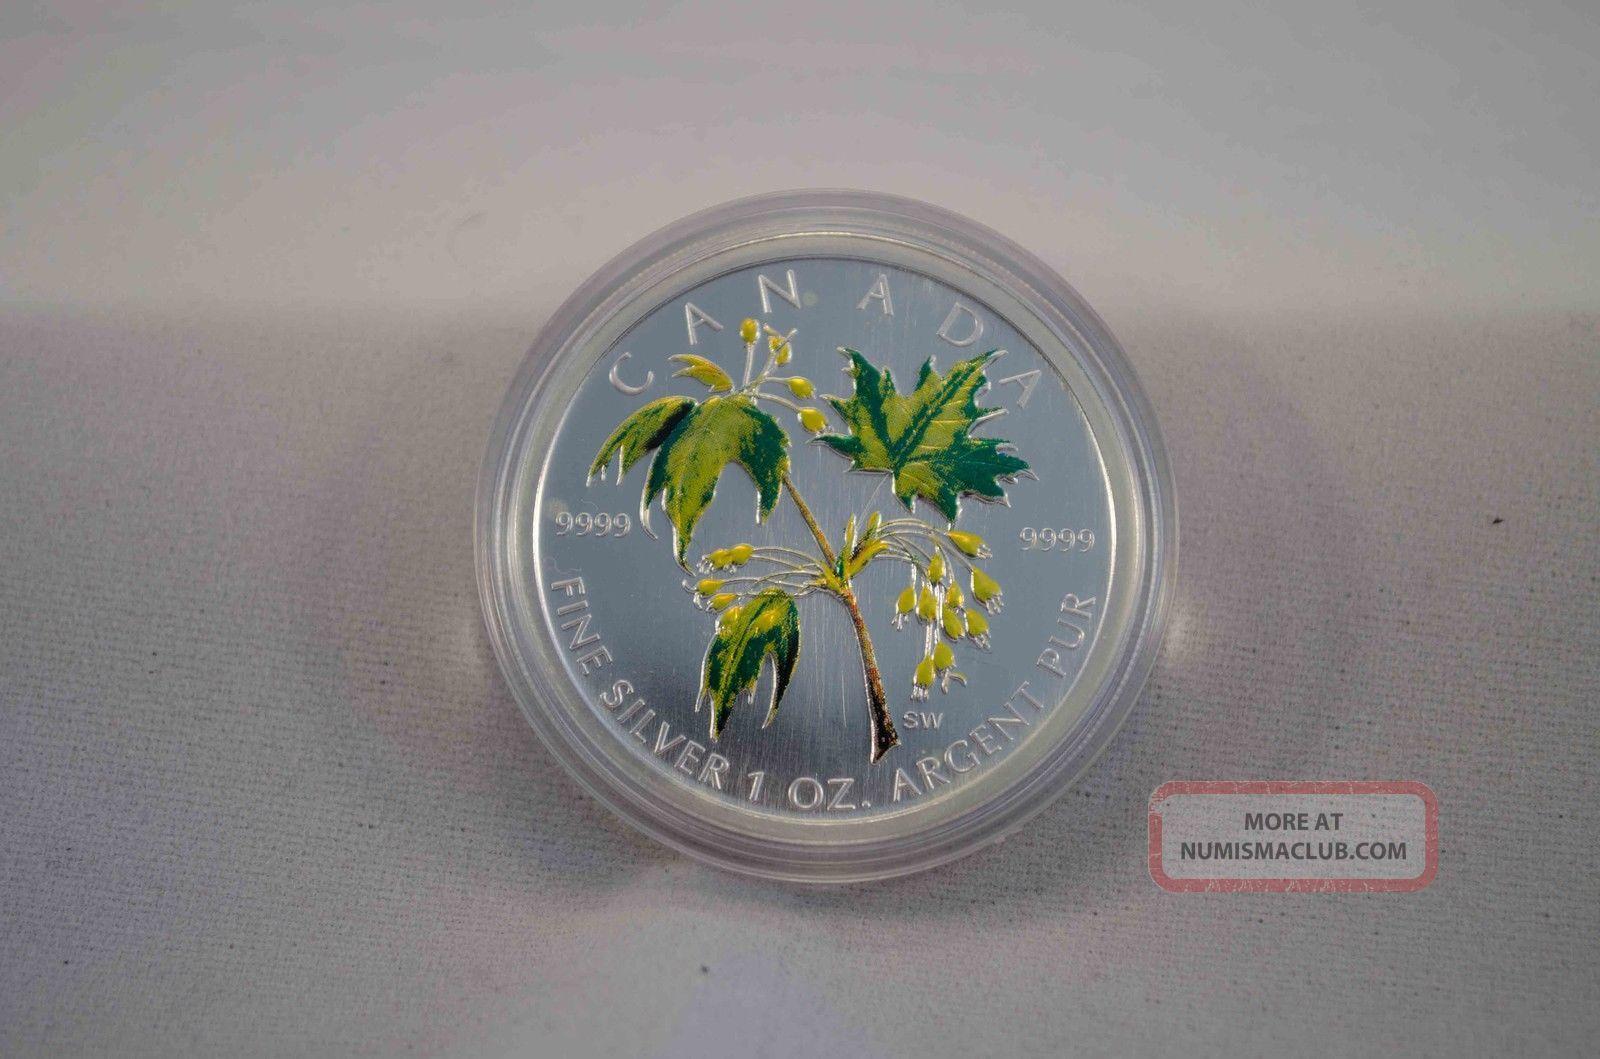 2003 Fine Silver Coloured Maple Leaf